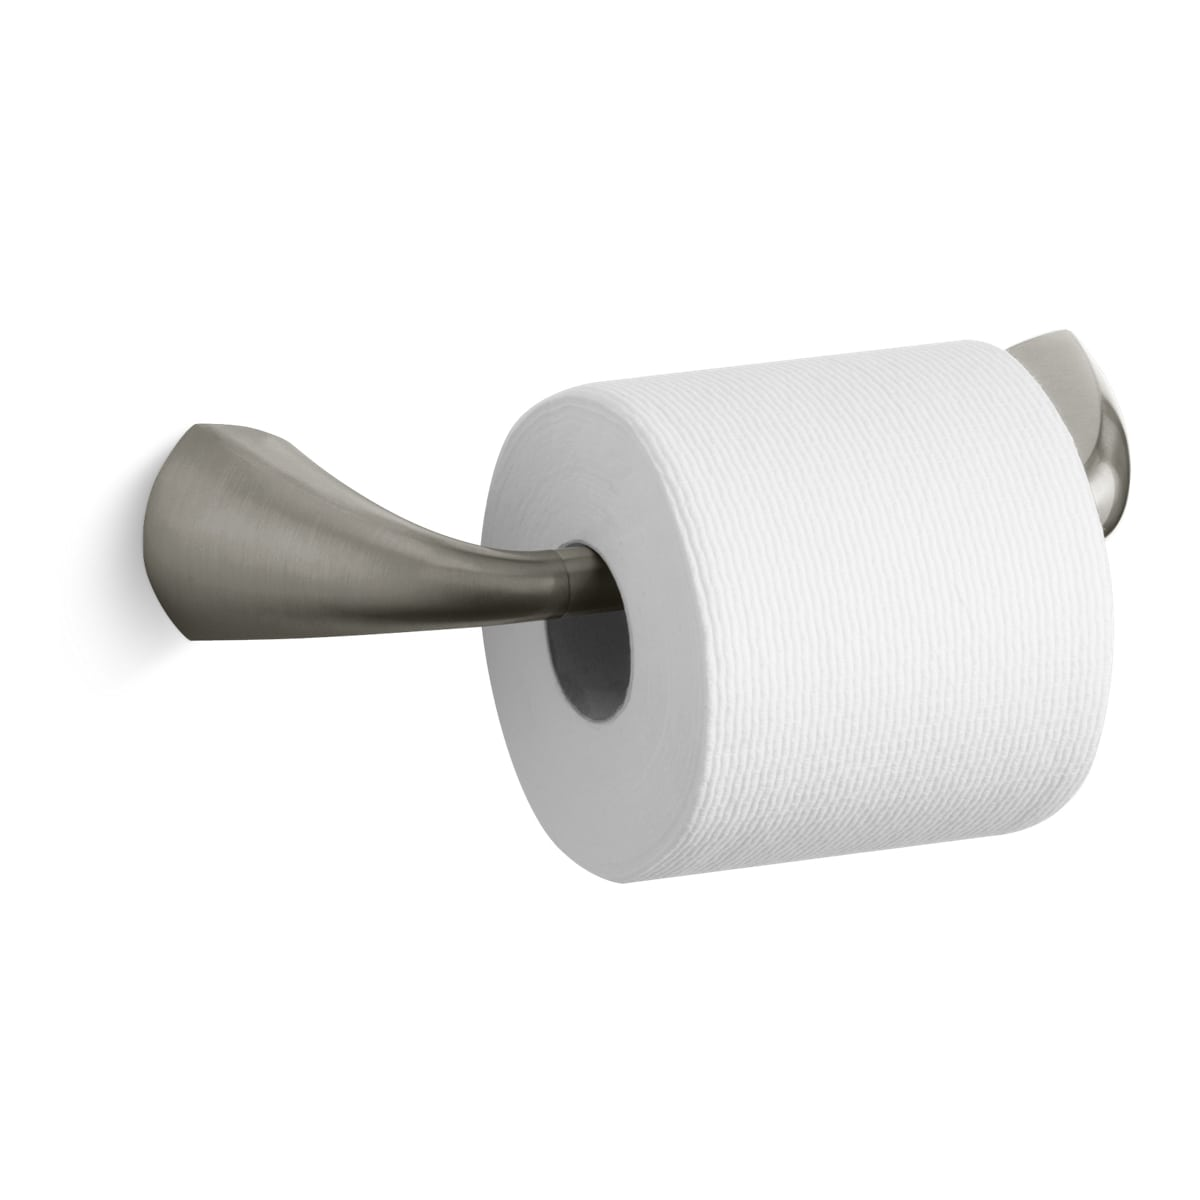 KOHLER Bathroom Toilet Paper Holder Brass Wall-Mount Double Post Polished Chrome